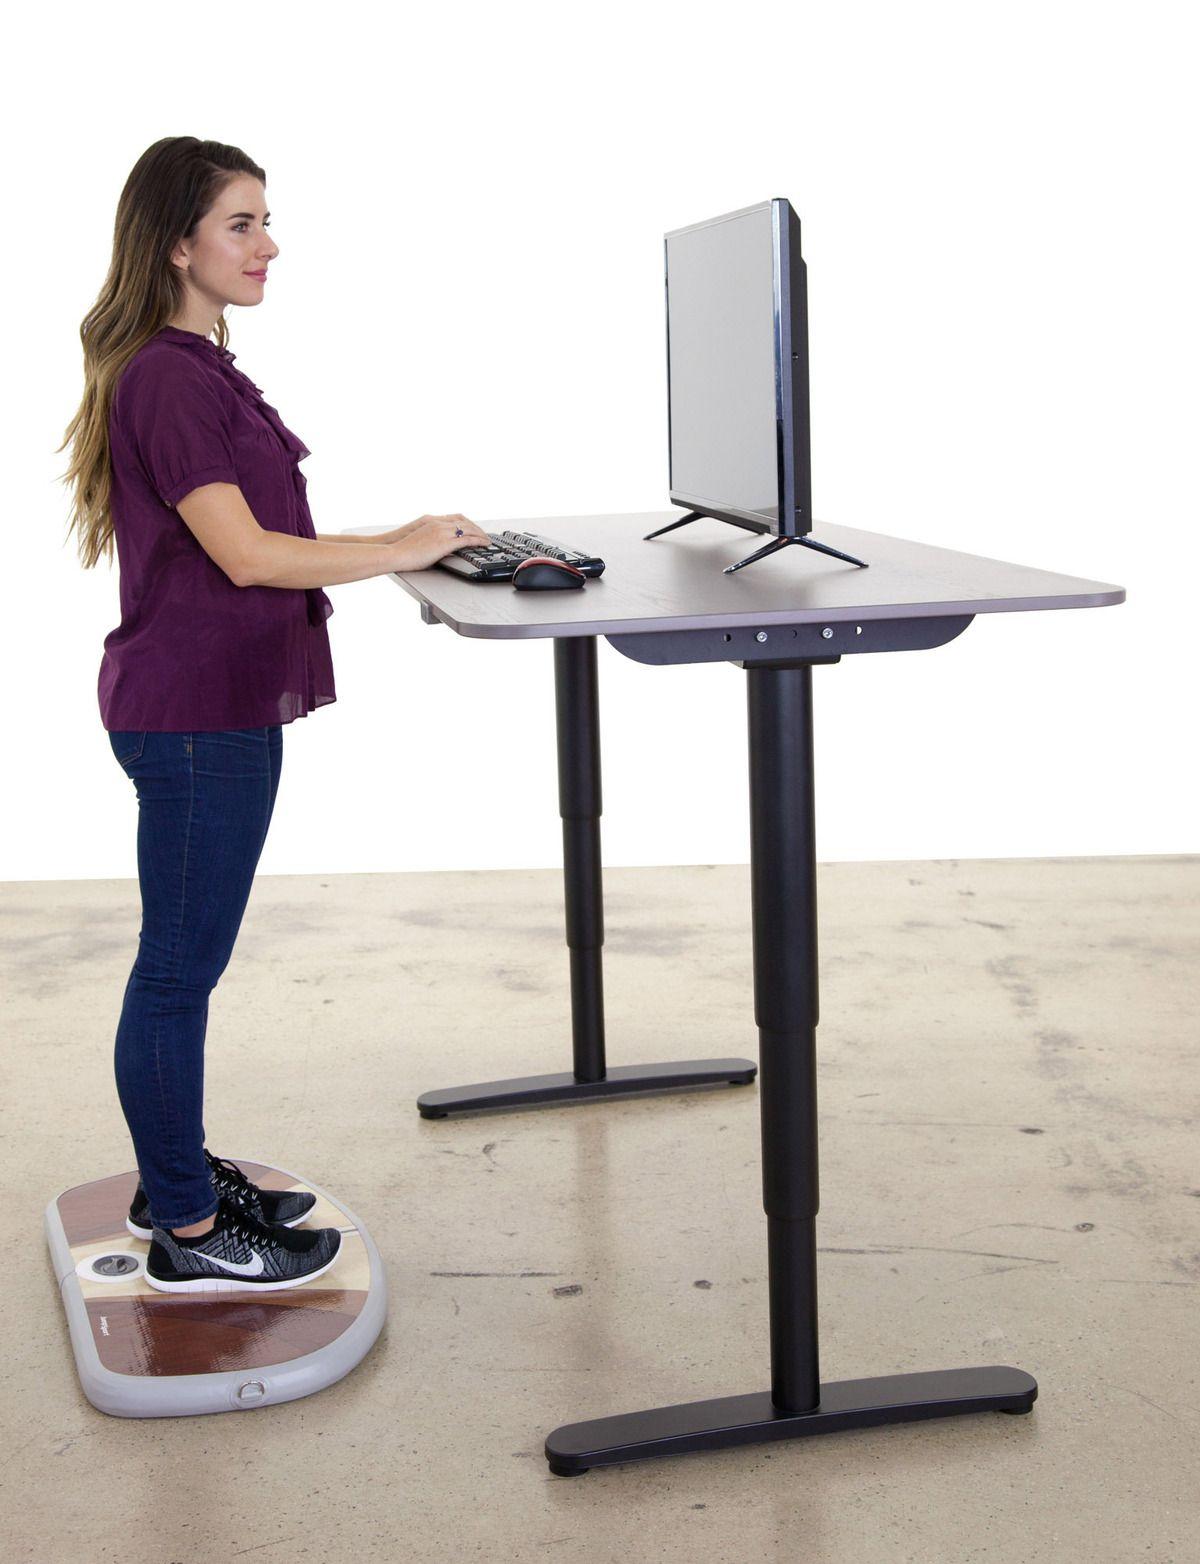 surf at your standing desk with this new kickstarter board bay area blog ideas standing desk. Black Bedroom Furniture Sets. Home Design Ideas